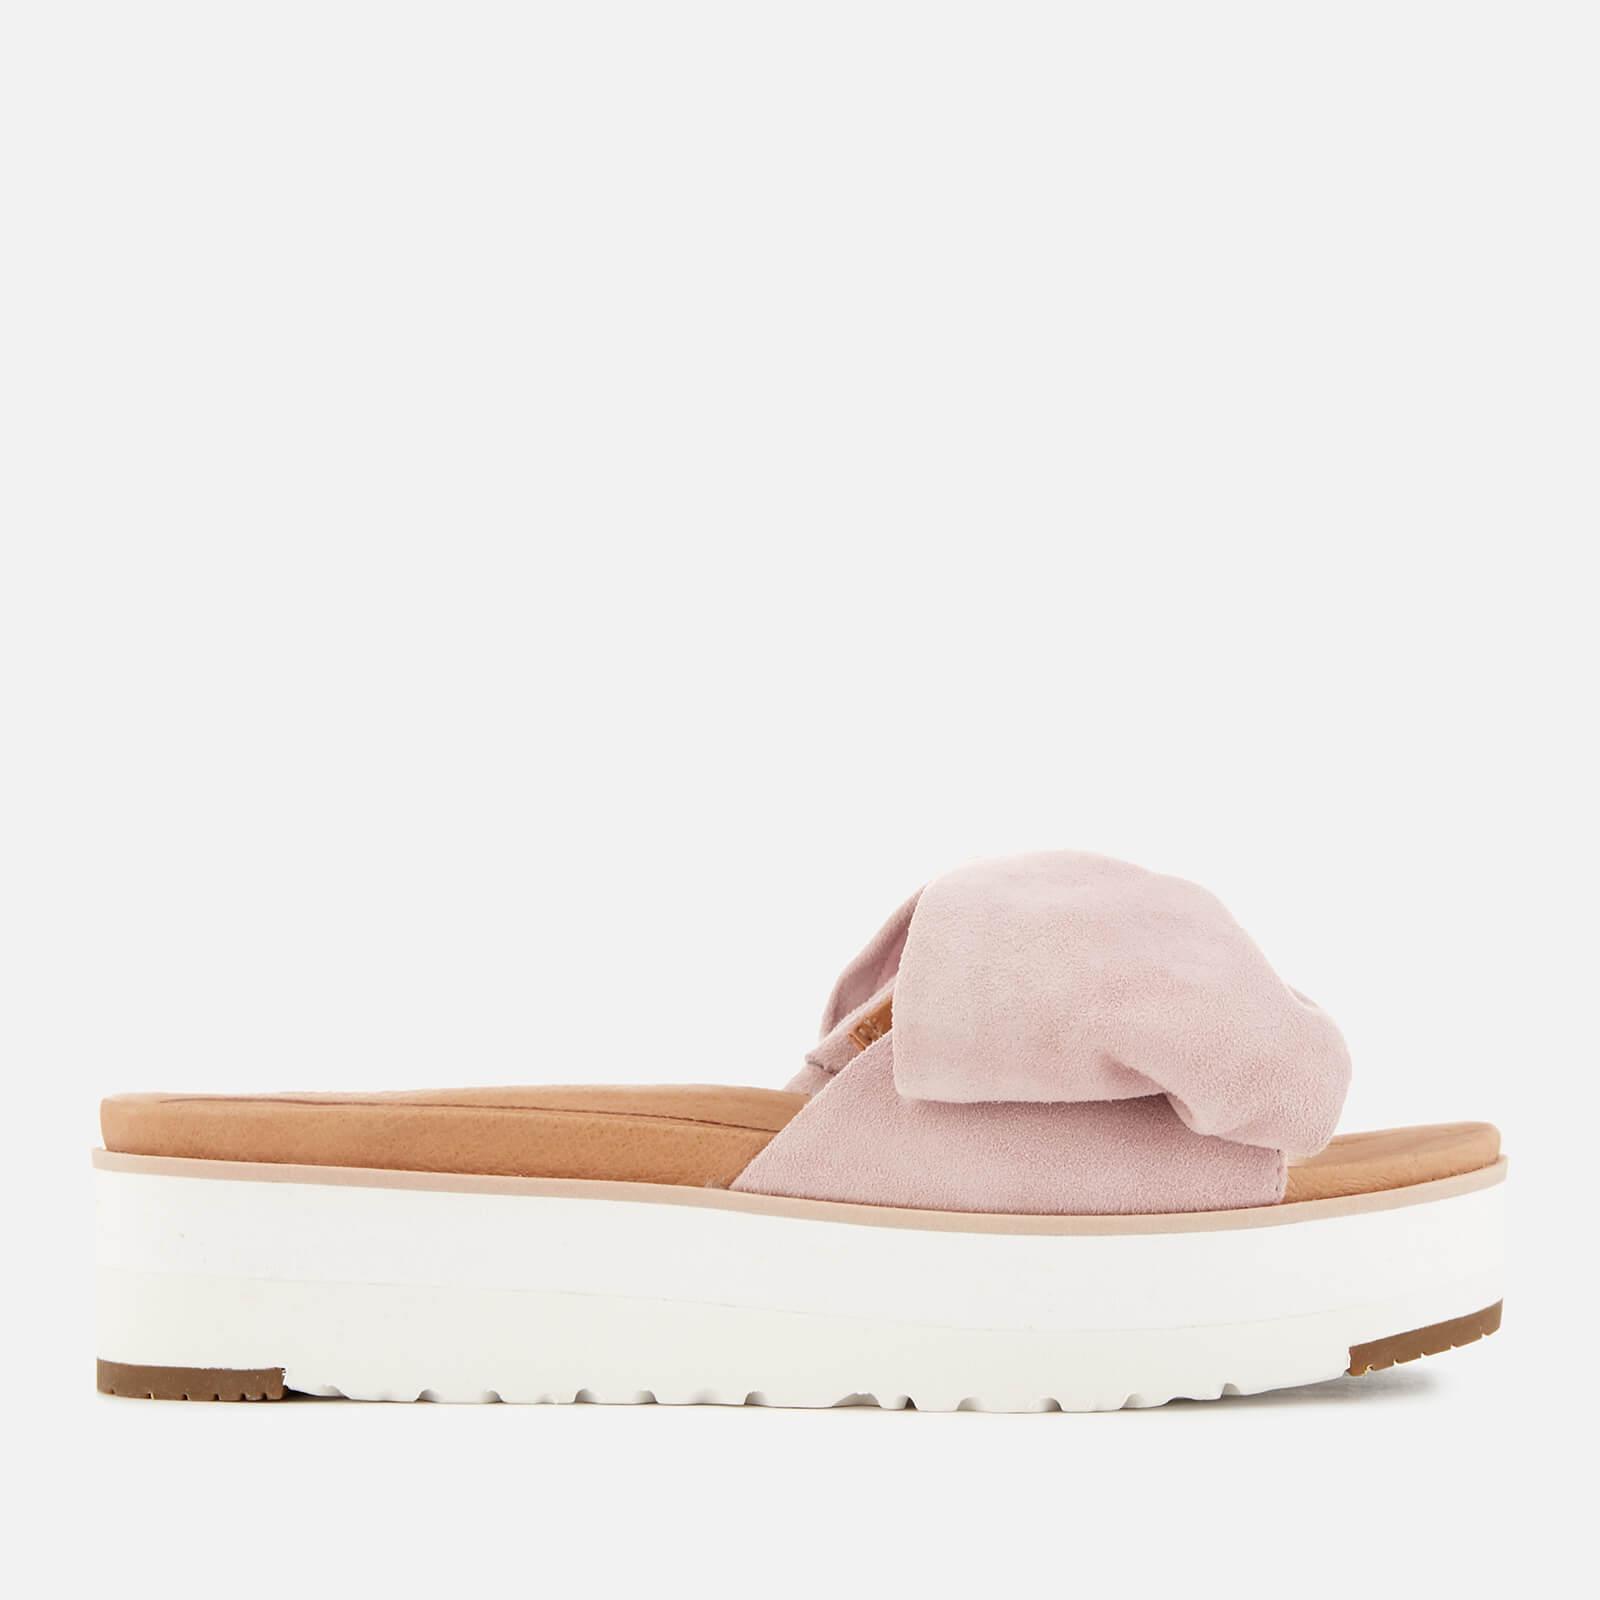 9a66b6bf0 UGG Women's Joan Suede Bow Flatform Slide Sandals - Seashell Pink   FREE UK  Delivery   Allsole